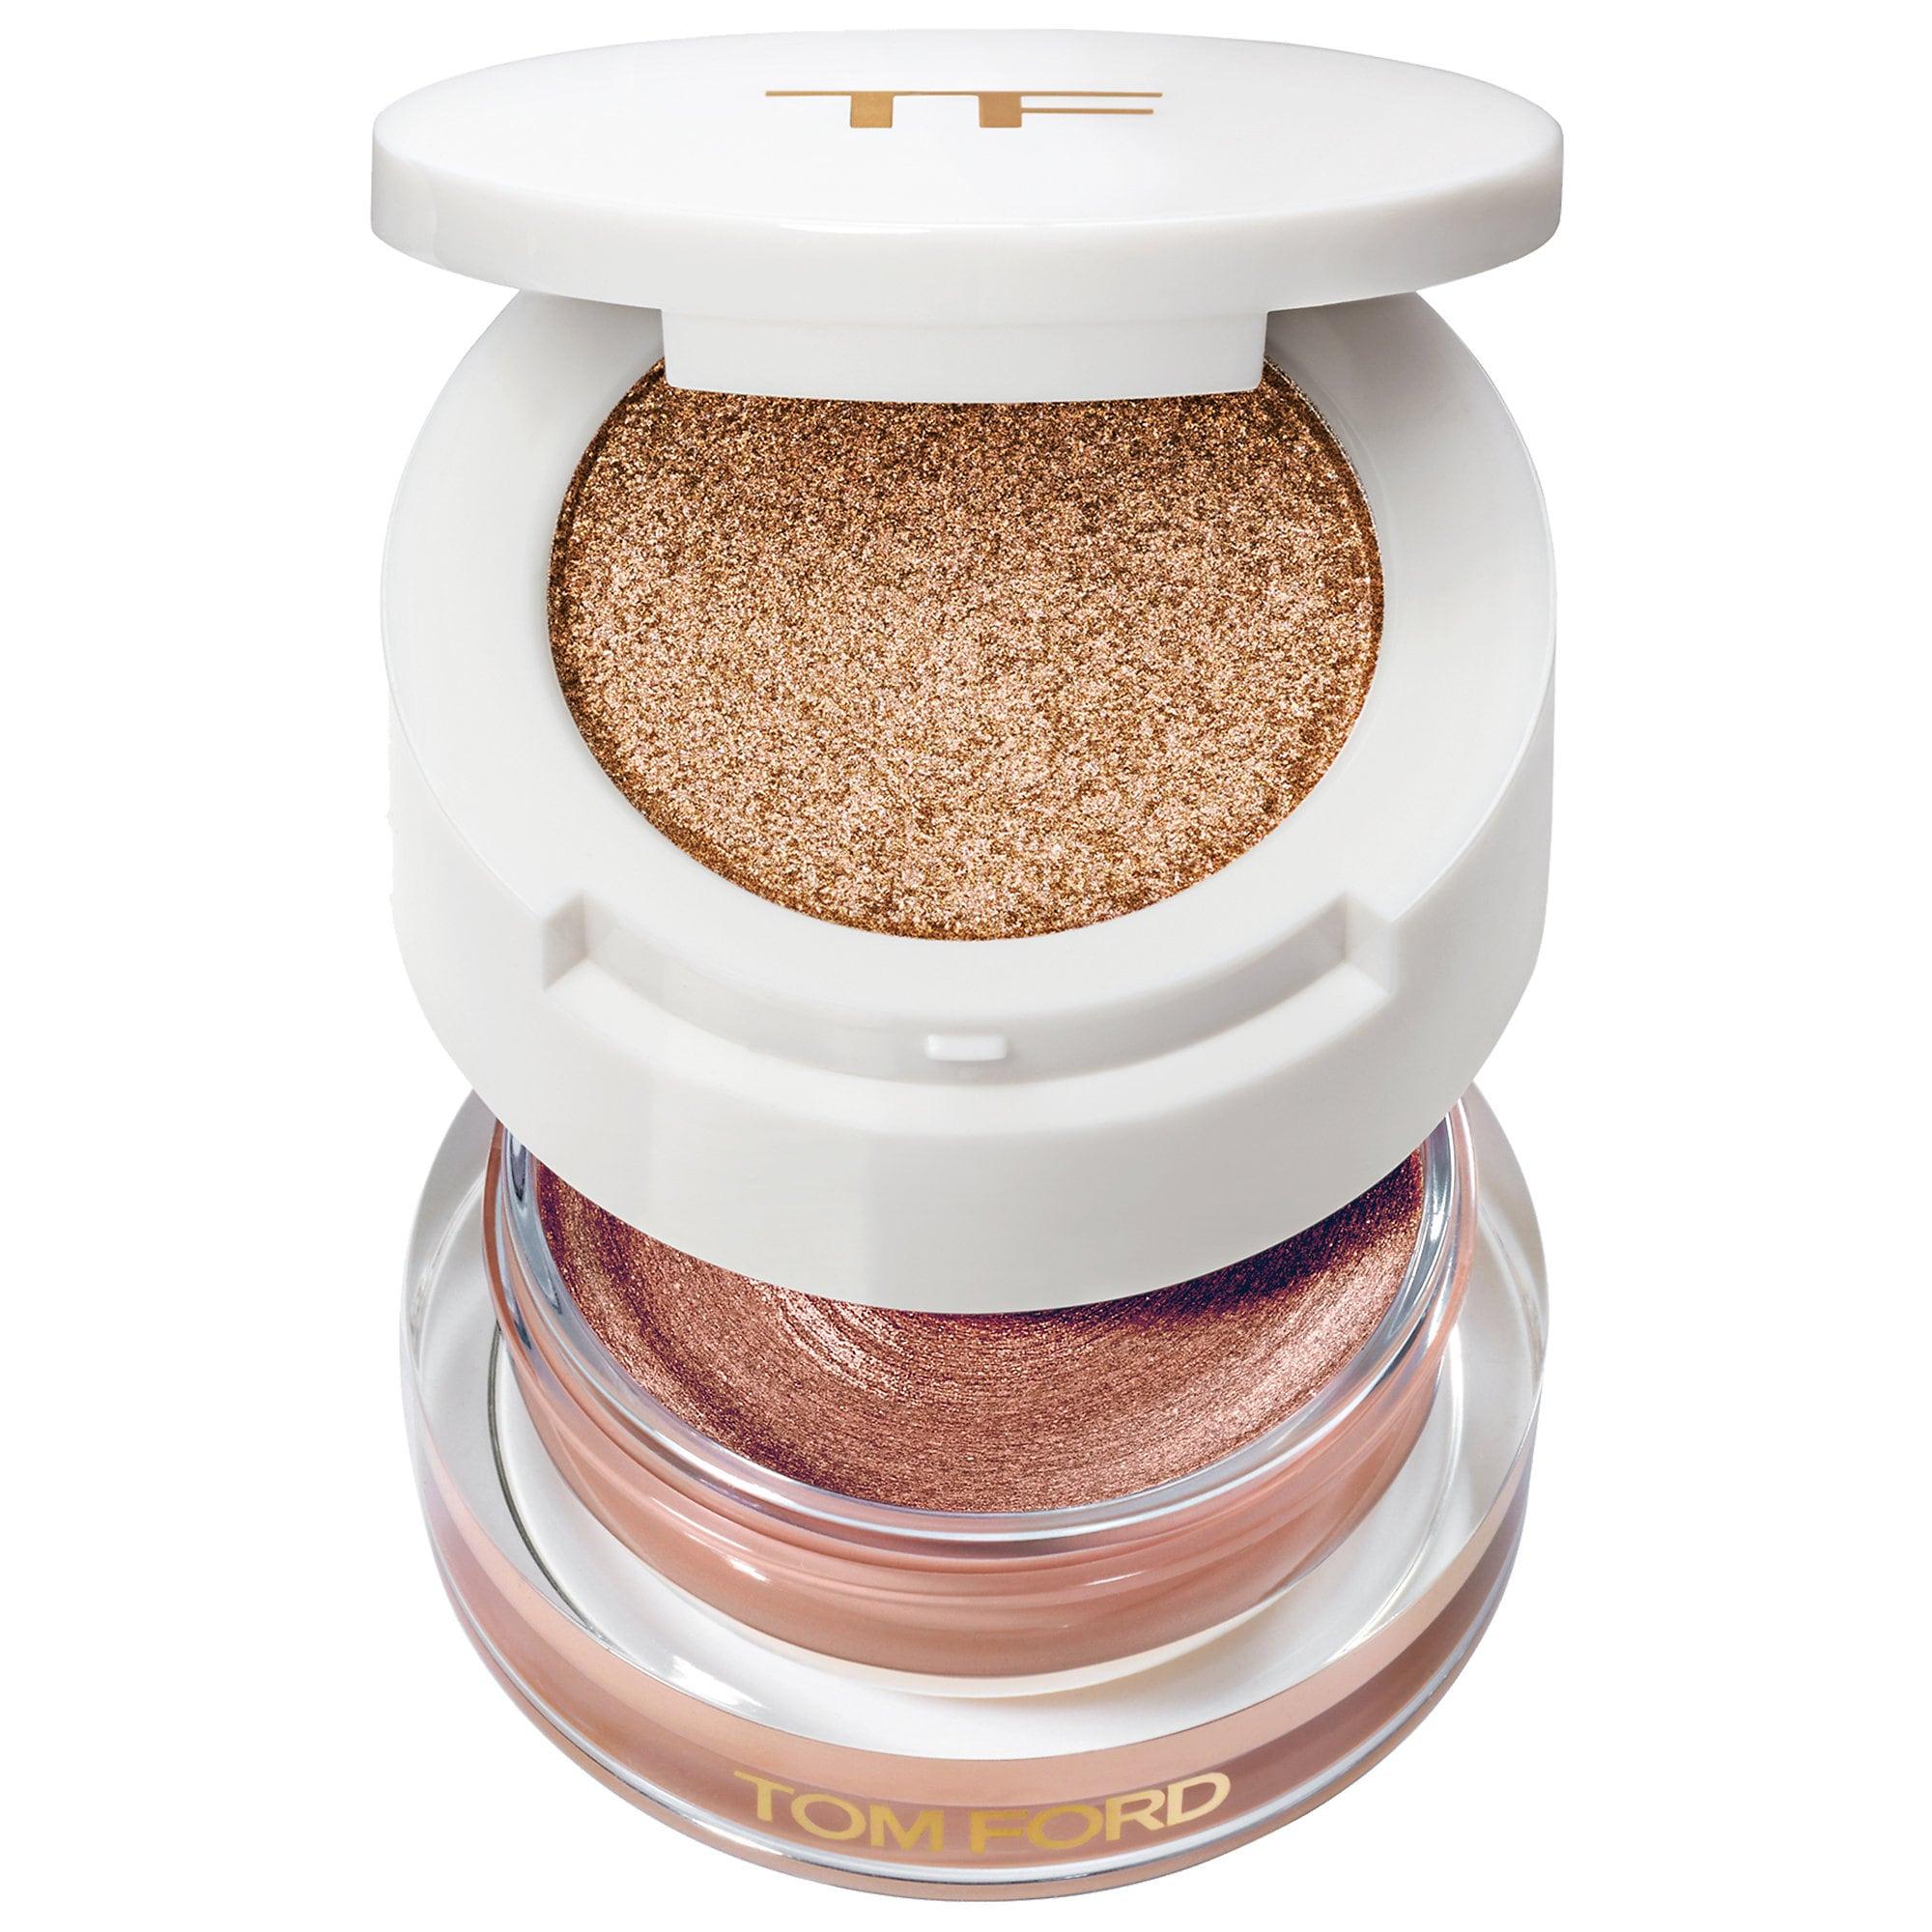 Tom Ford - Soleil Neige Cream and Powder Eye Color